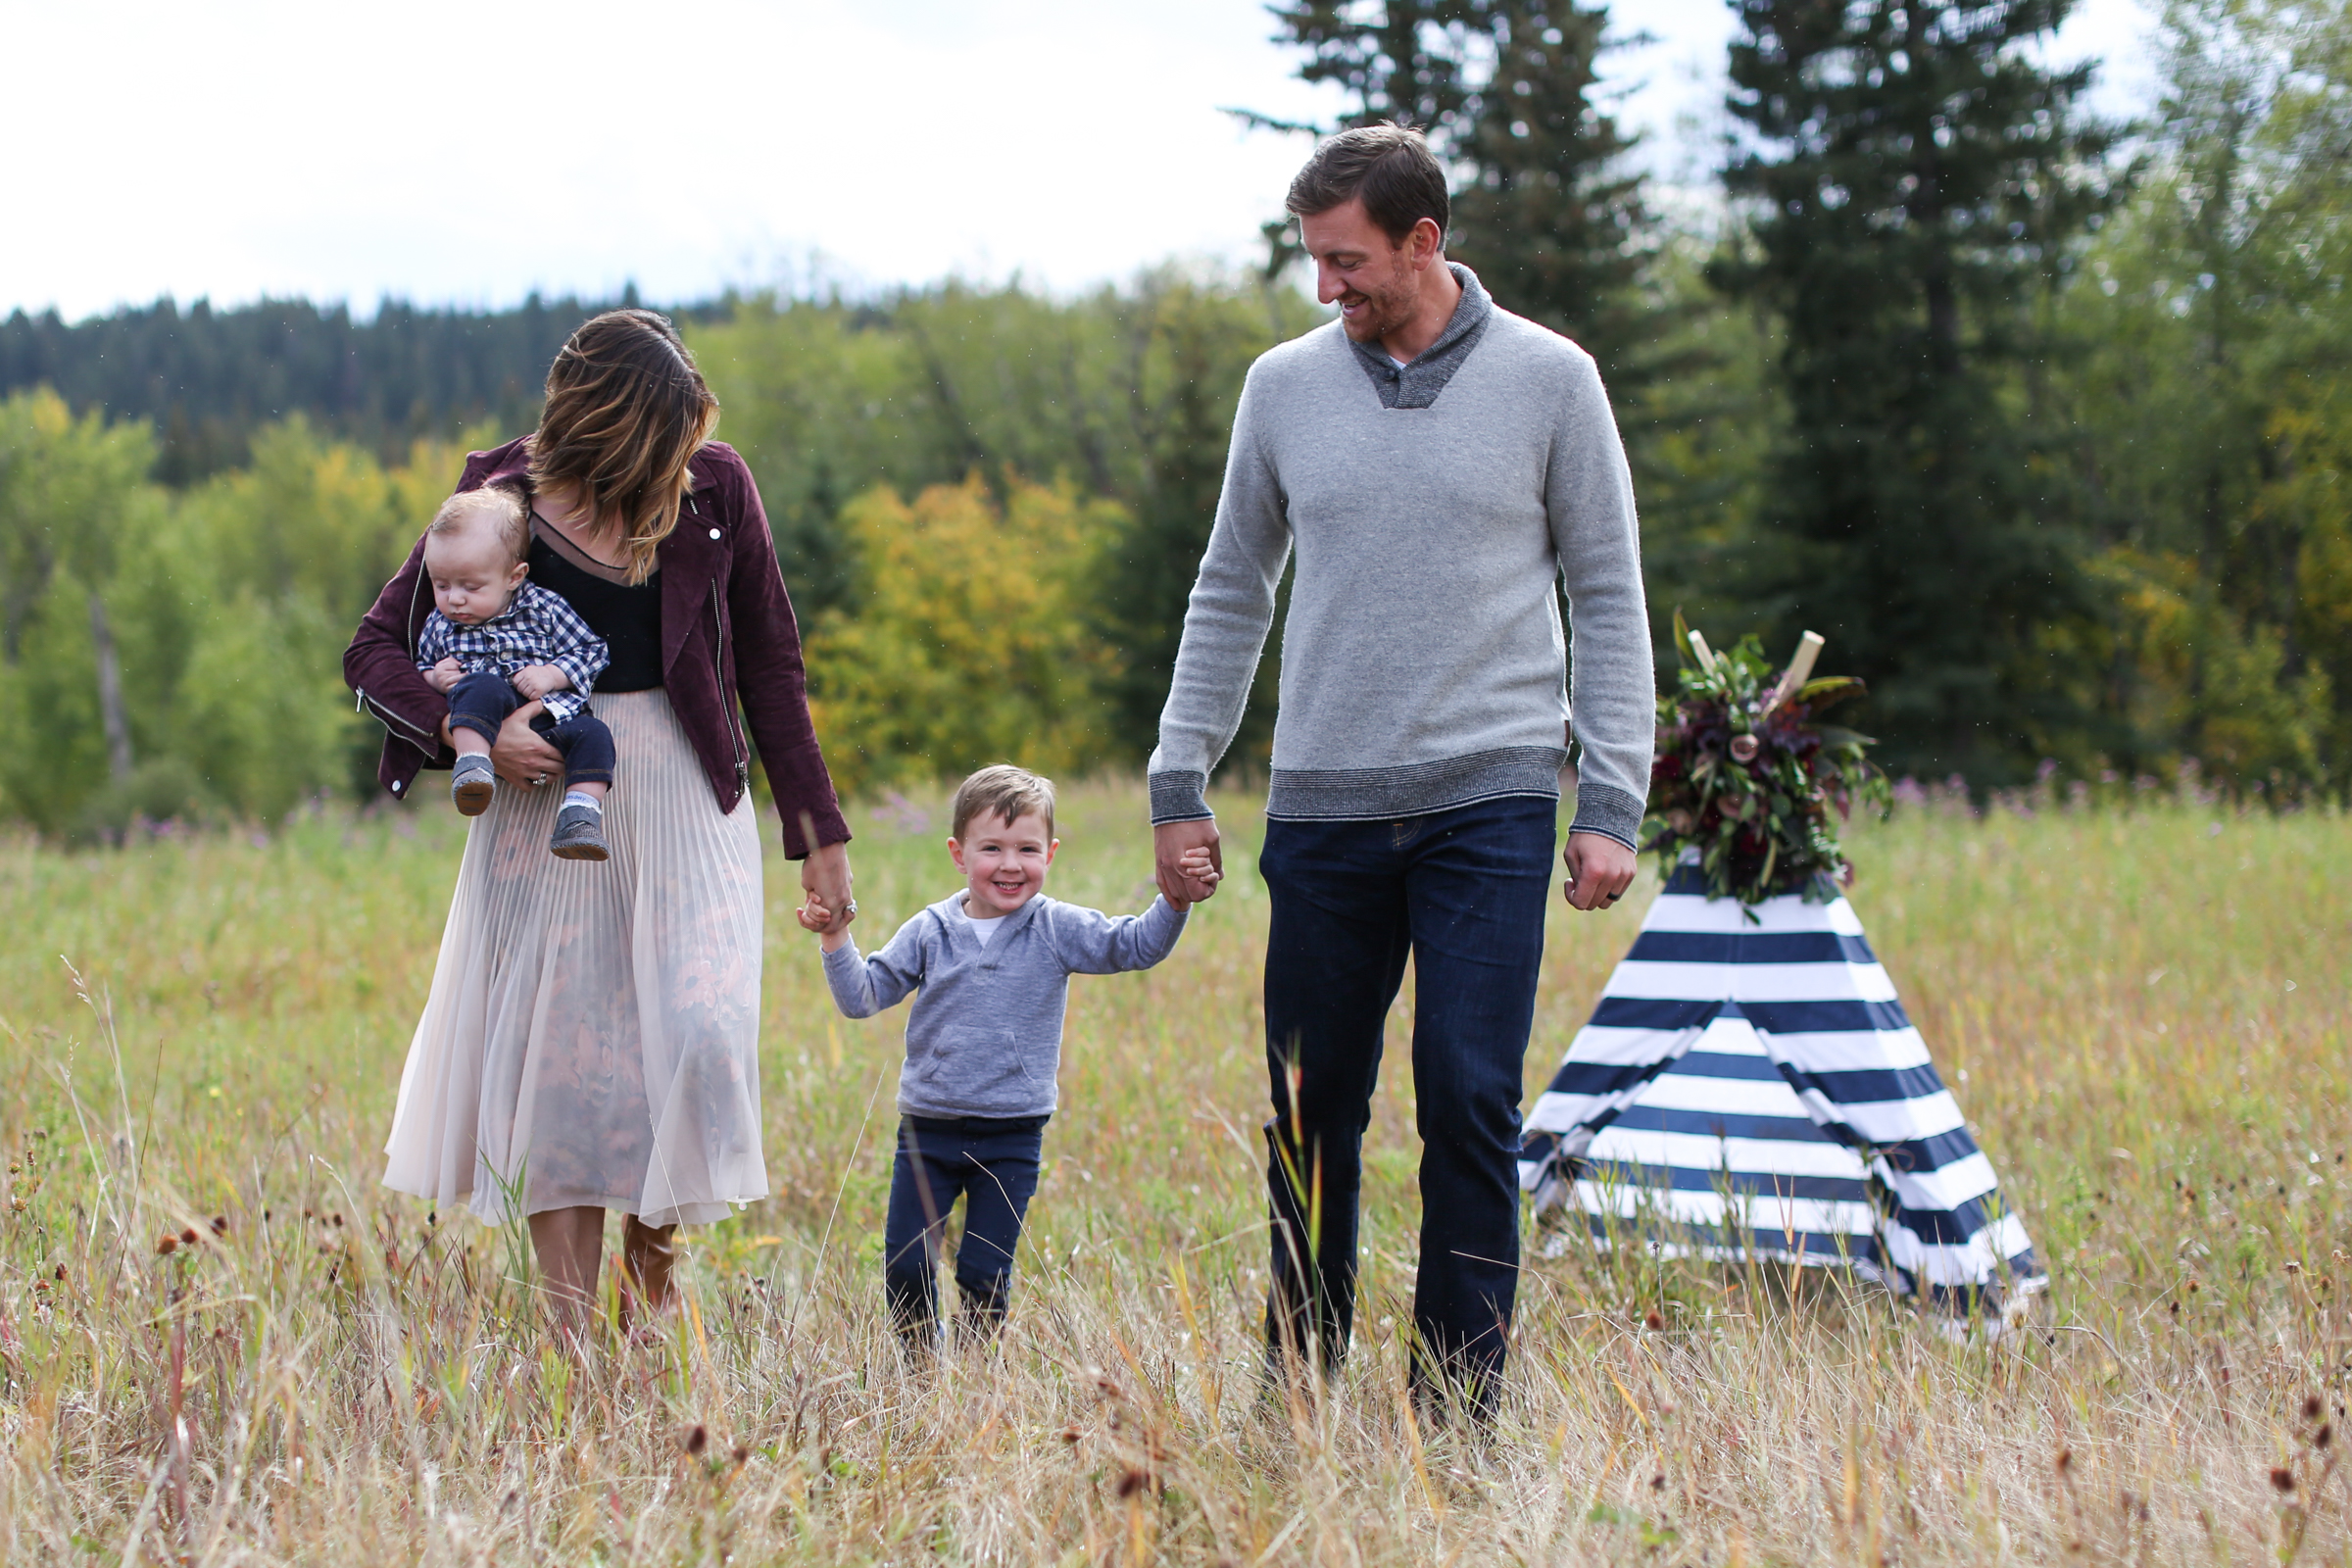 Fall-Family-Creative-Lindsay_Skeans_Photography-6.jpg